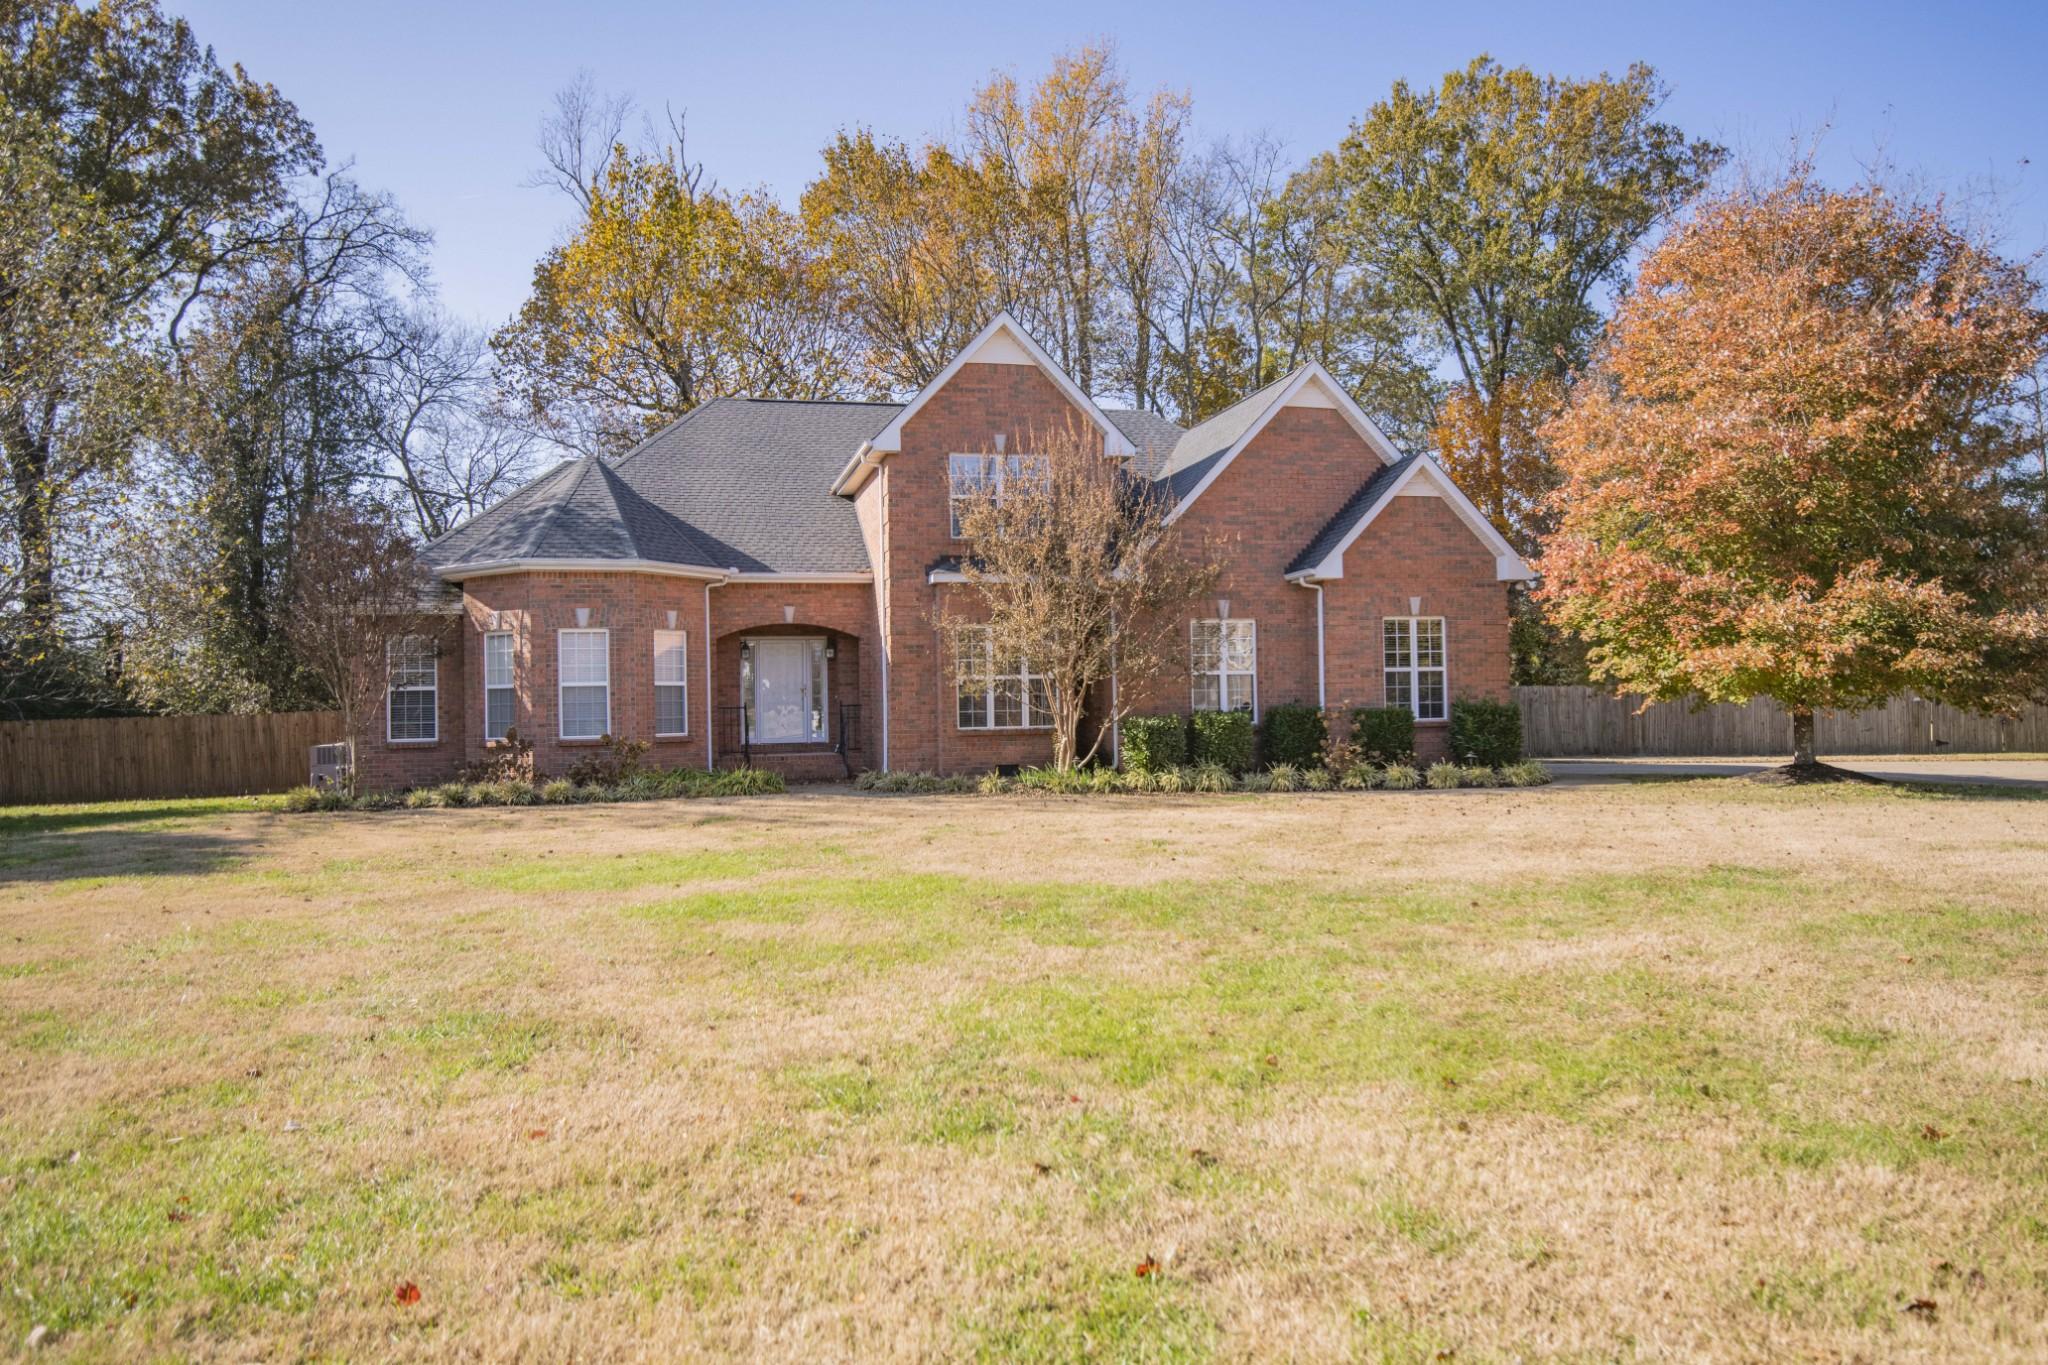 124 Regina Court, Murfreesboro, TN 37128 - Murfreesboro, TN real estate listing